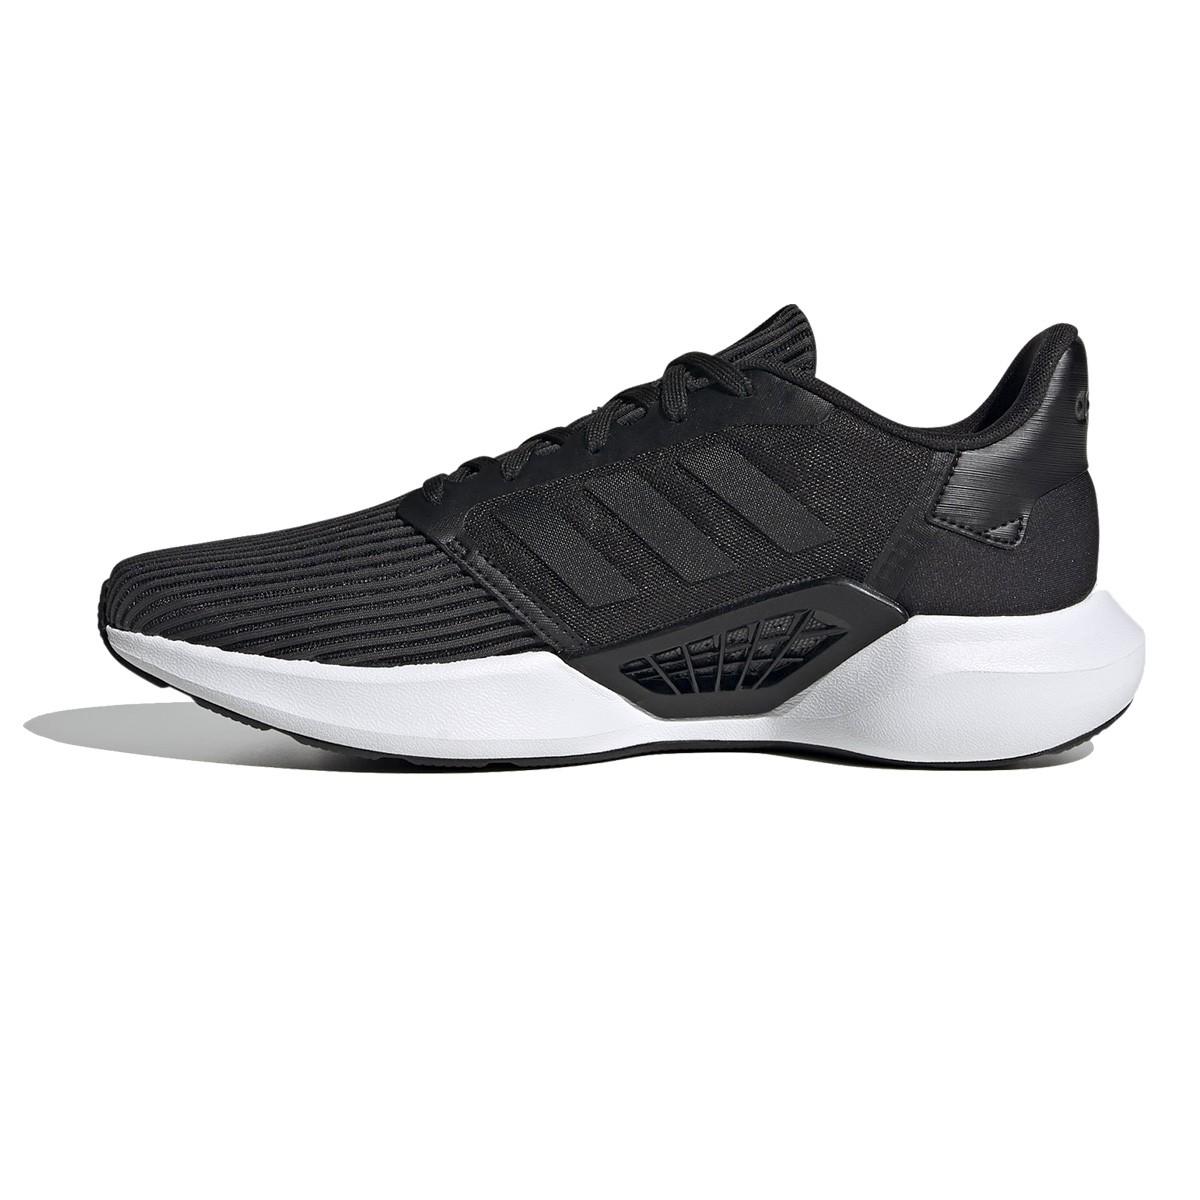 Tênis Adidas Ventice Masculino